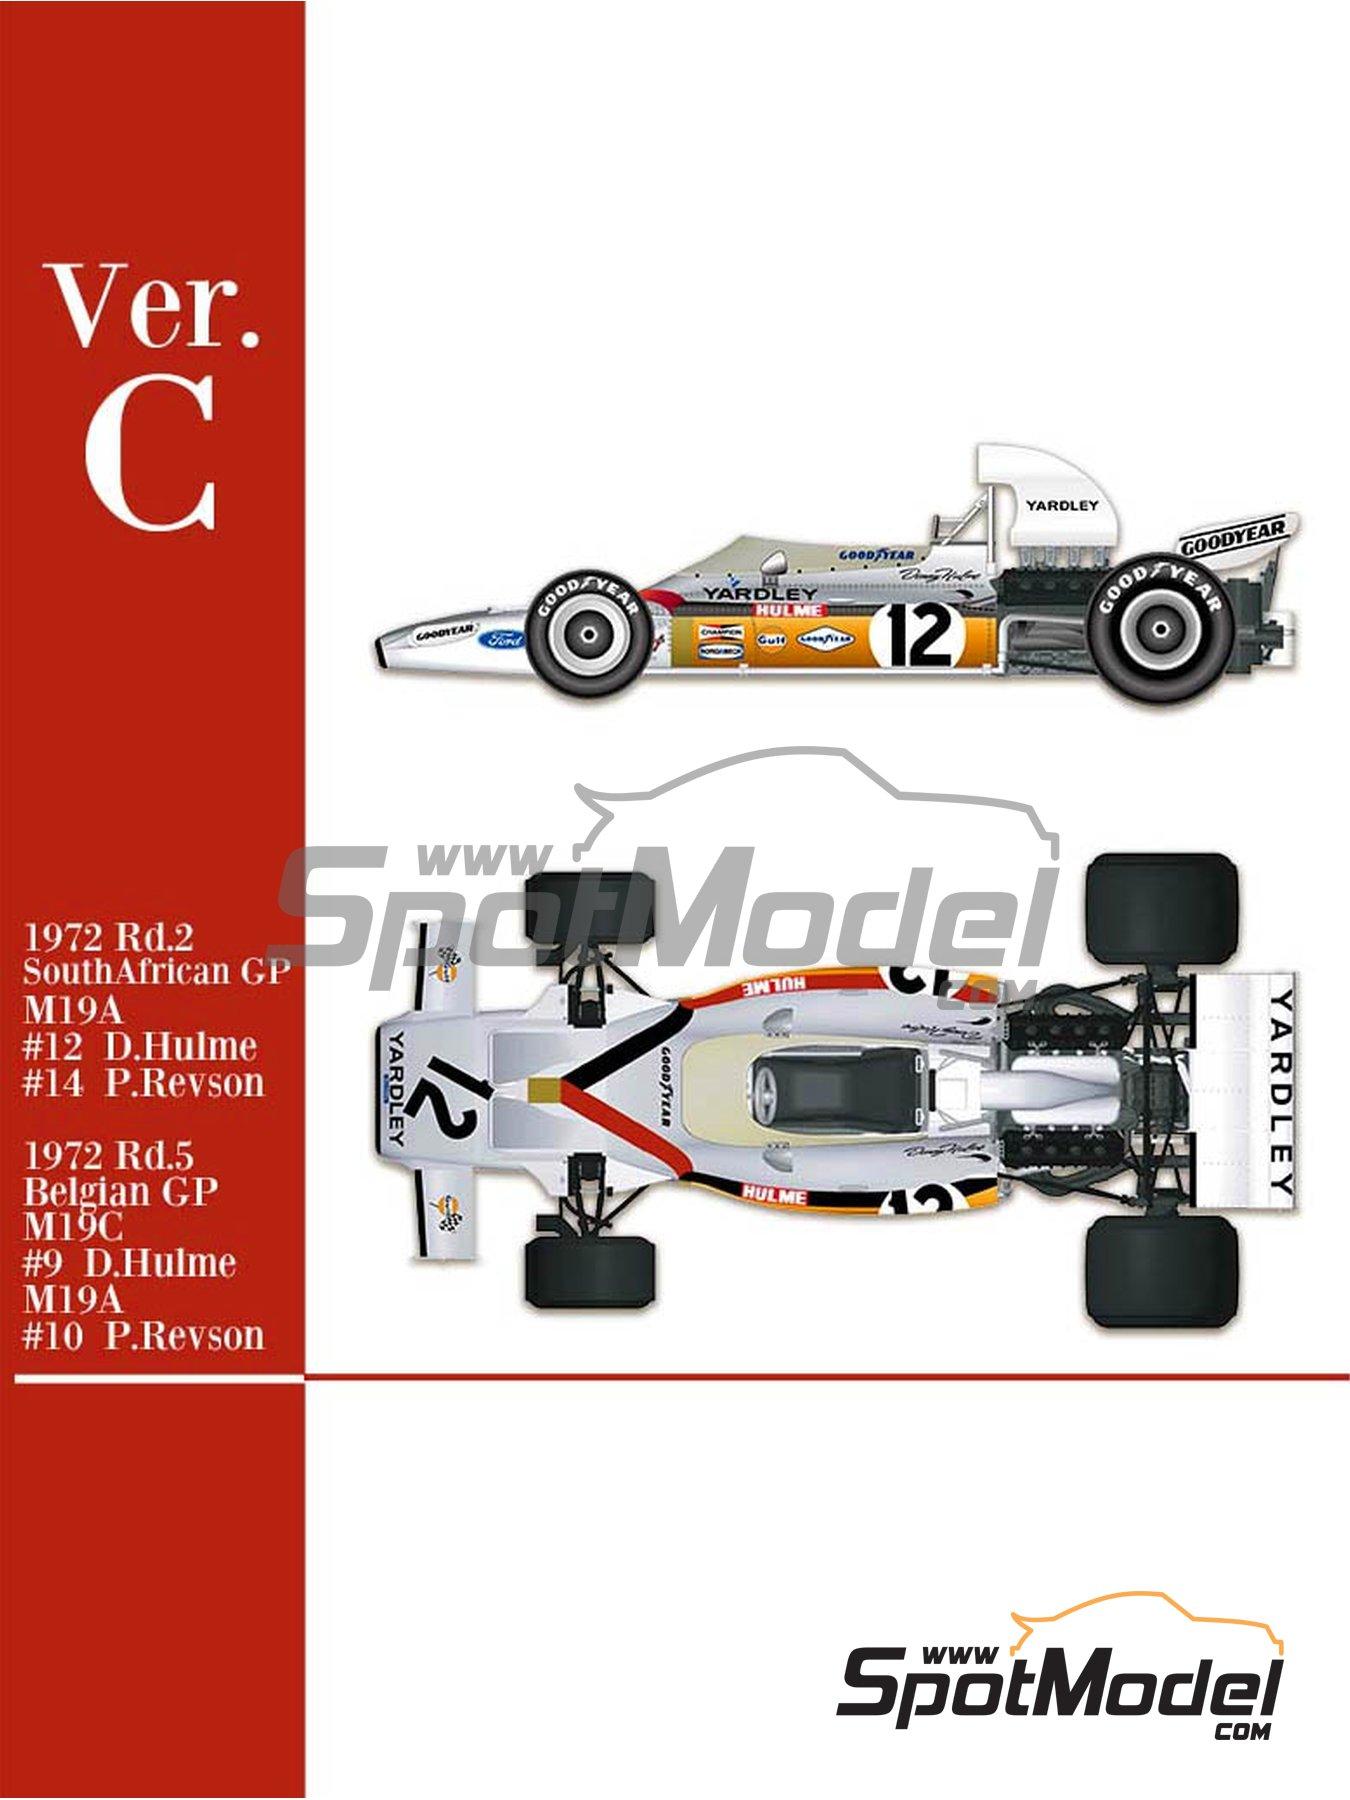 McLaren Ford M19A - Gran Premio de Belgica, Gran Premio de Sudafrica 1972 | Maqueta de coche en escala1/43 fabricado por Model Factory Hiro (ref.MFH-K586) image